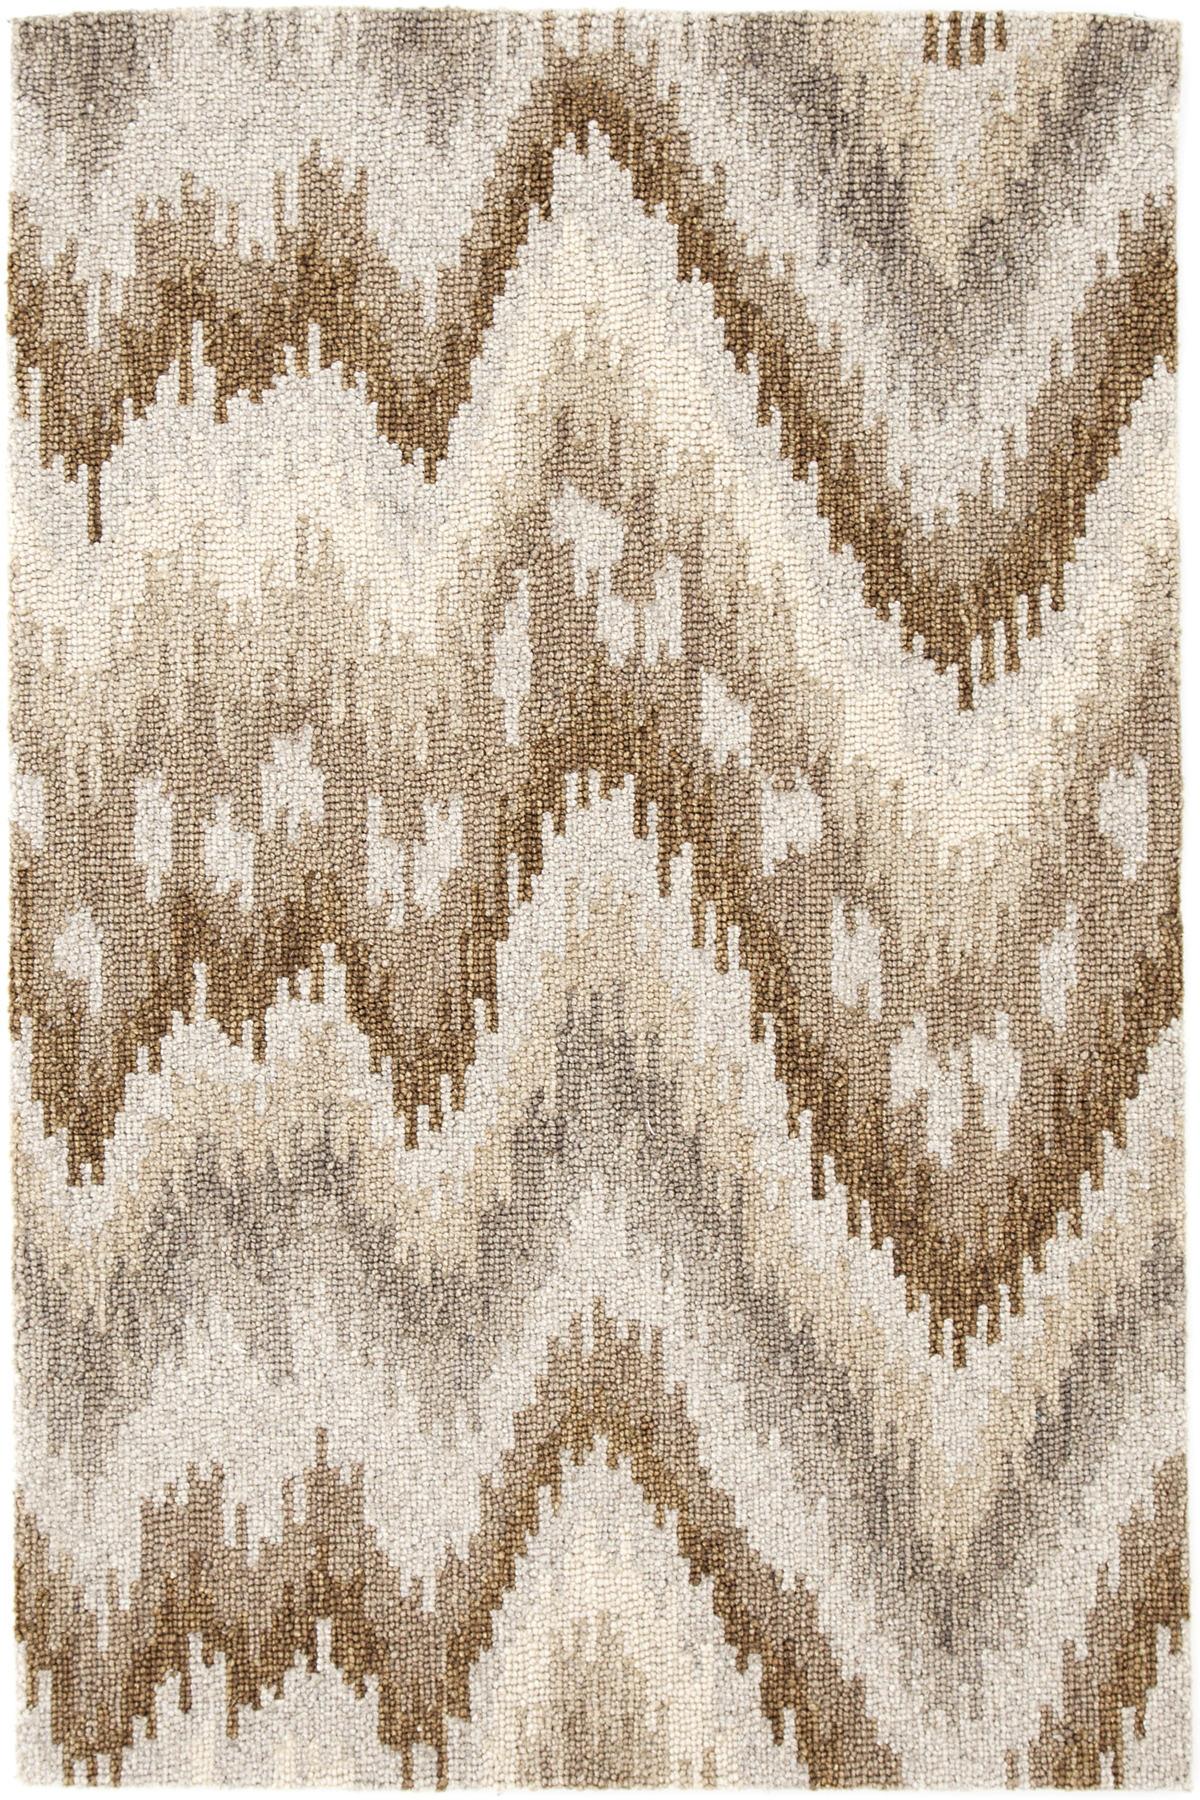 Graymond Micro Hooked Wool Rug